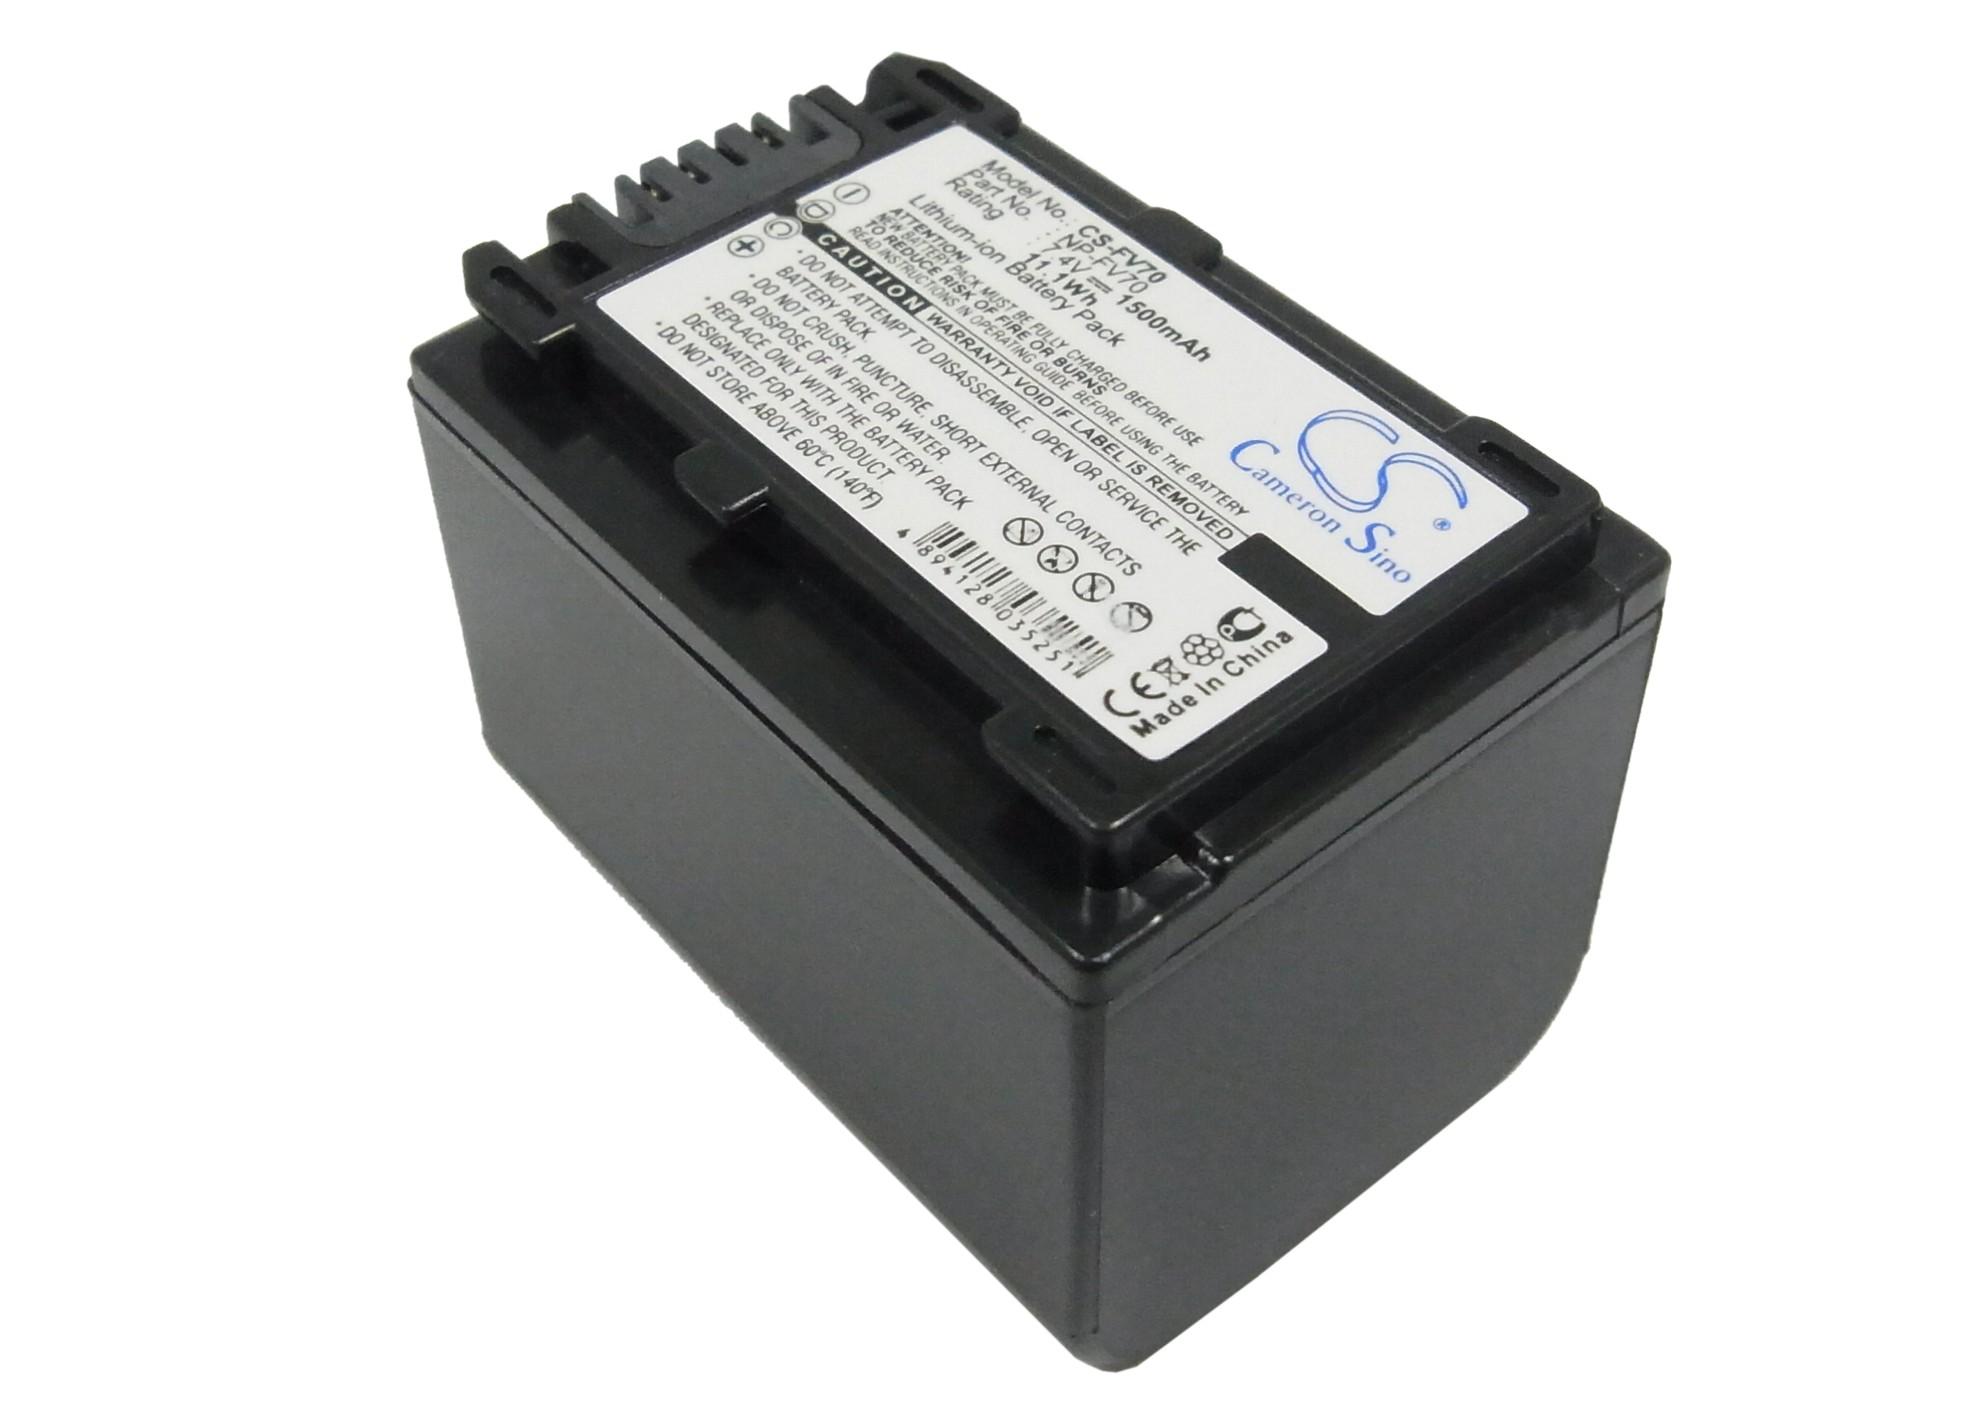 Cameron Sino baterie do kamer a fotoaparátů pro SONY DCR-SR90E 7.4V Li-ion 1500mAh černá - neoriginální